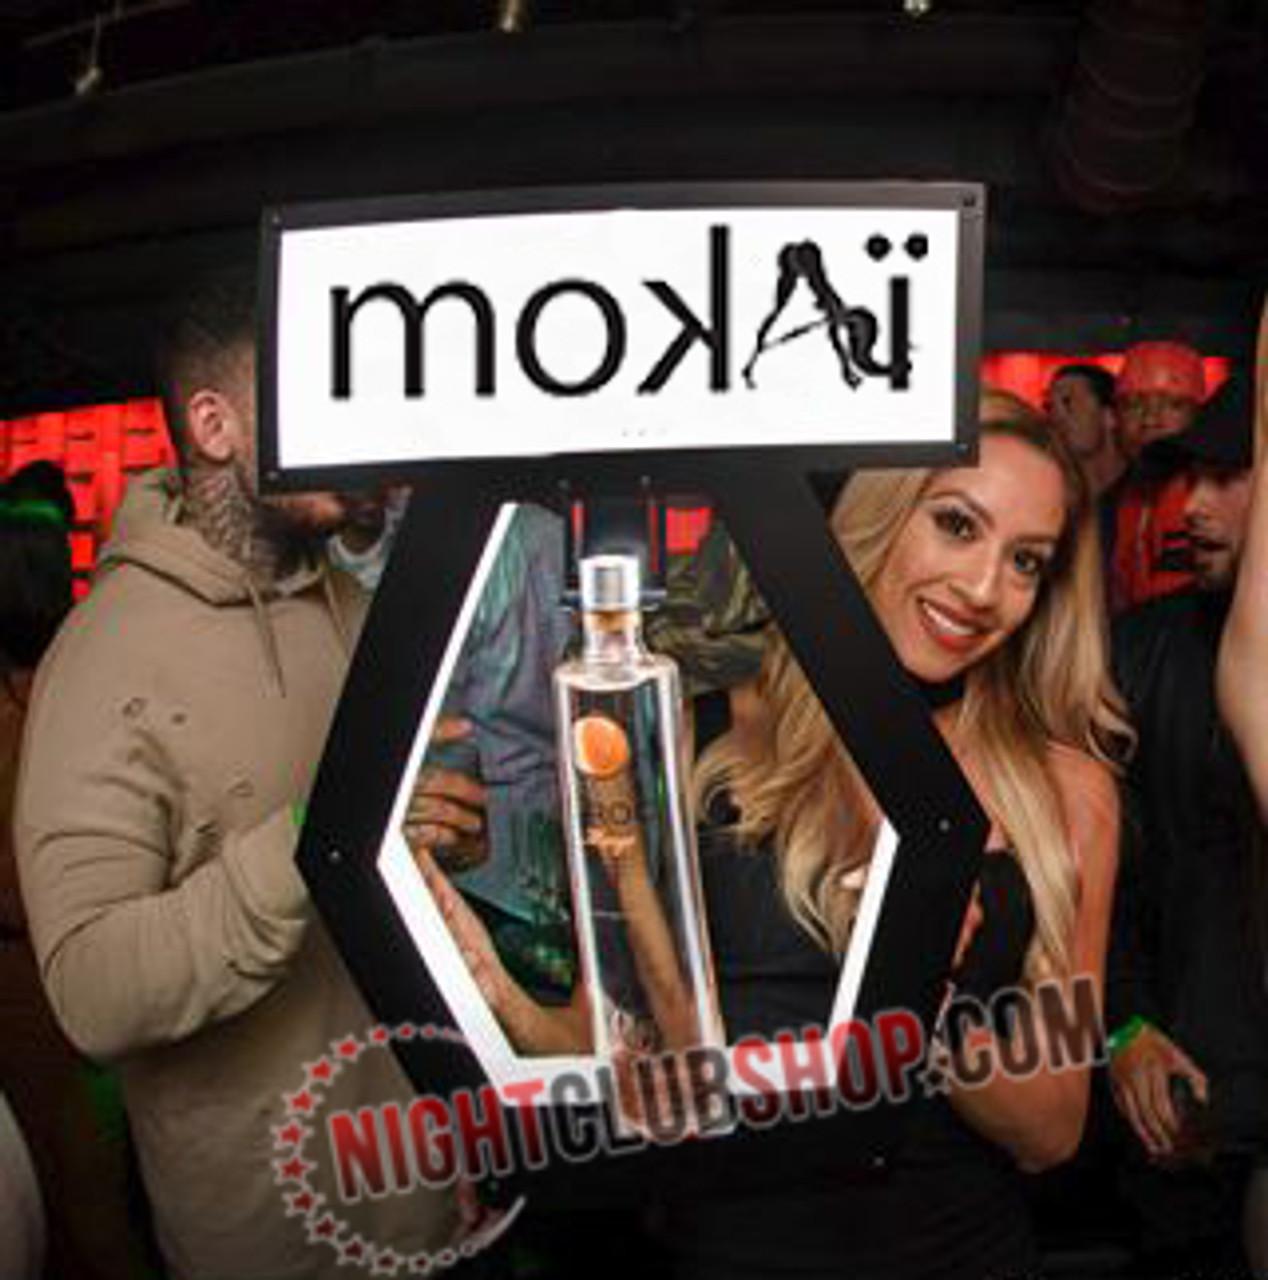 MOKAI_MIAMI_Nightclub_VIP_Lightbox_Champagne_Liquor_Tray_interchangeable_Bottle_service_carrier_holder_tray_Presenter_caddie_caddy_Banner_Top